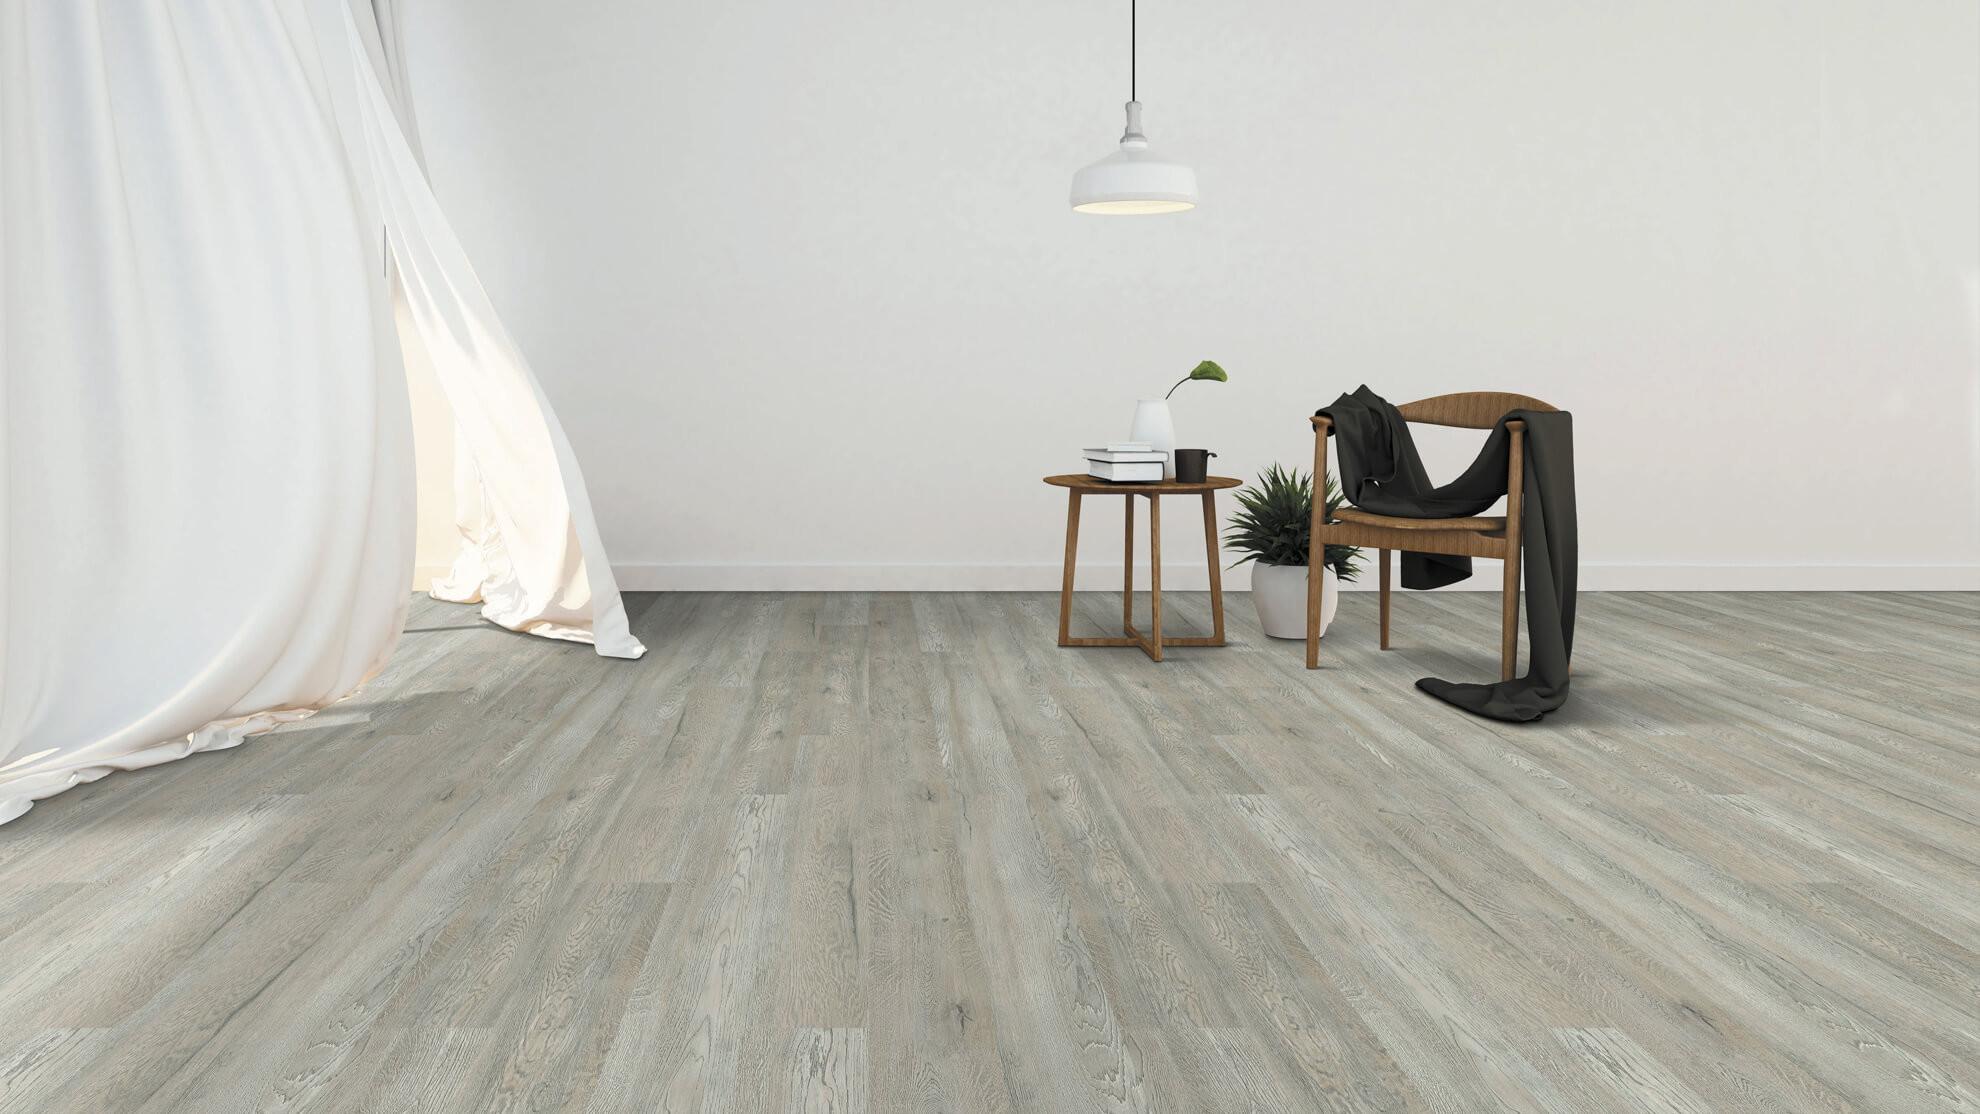 naf hardwood flooring canada of earthwerks flooring for noble classic plus alaska oak ncr 9708